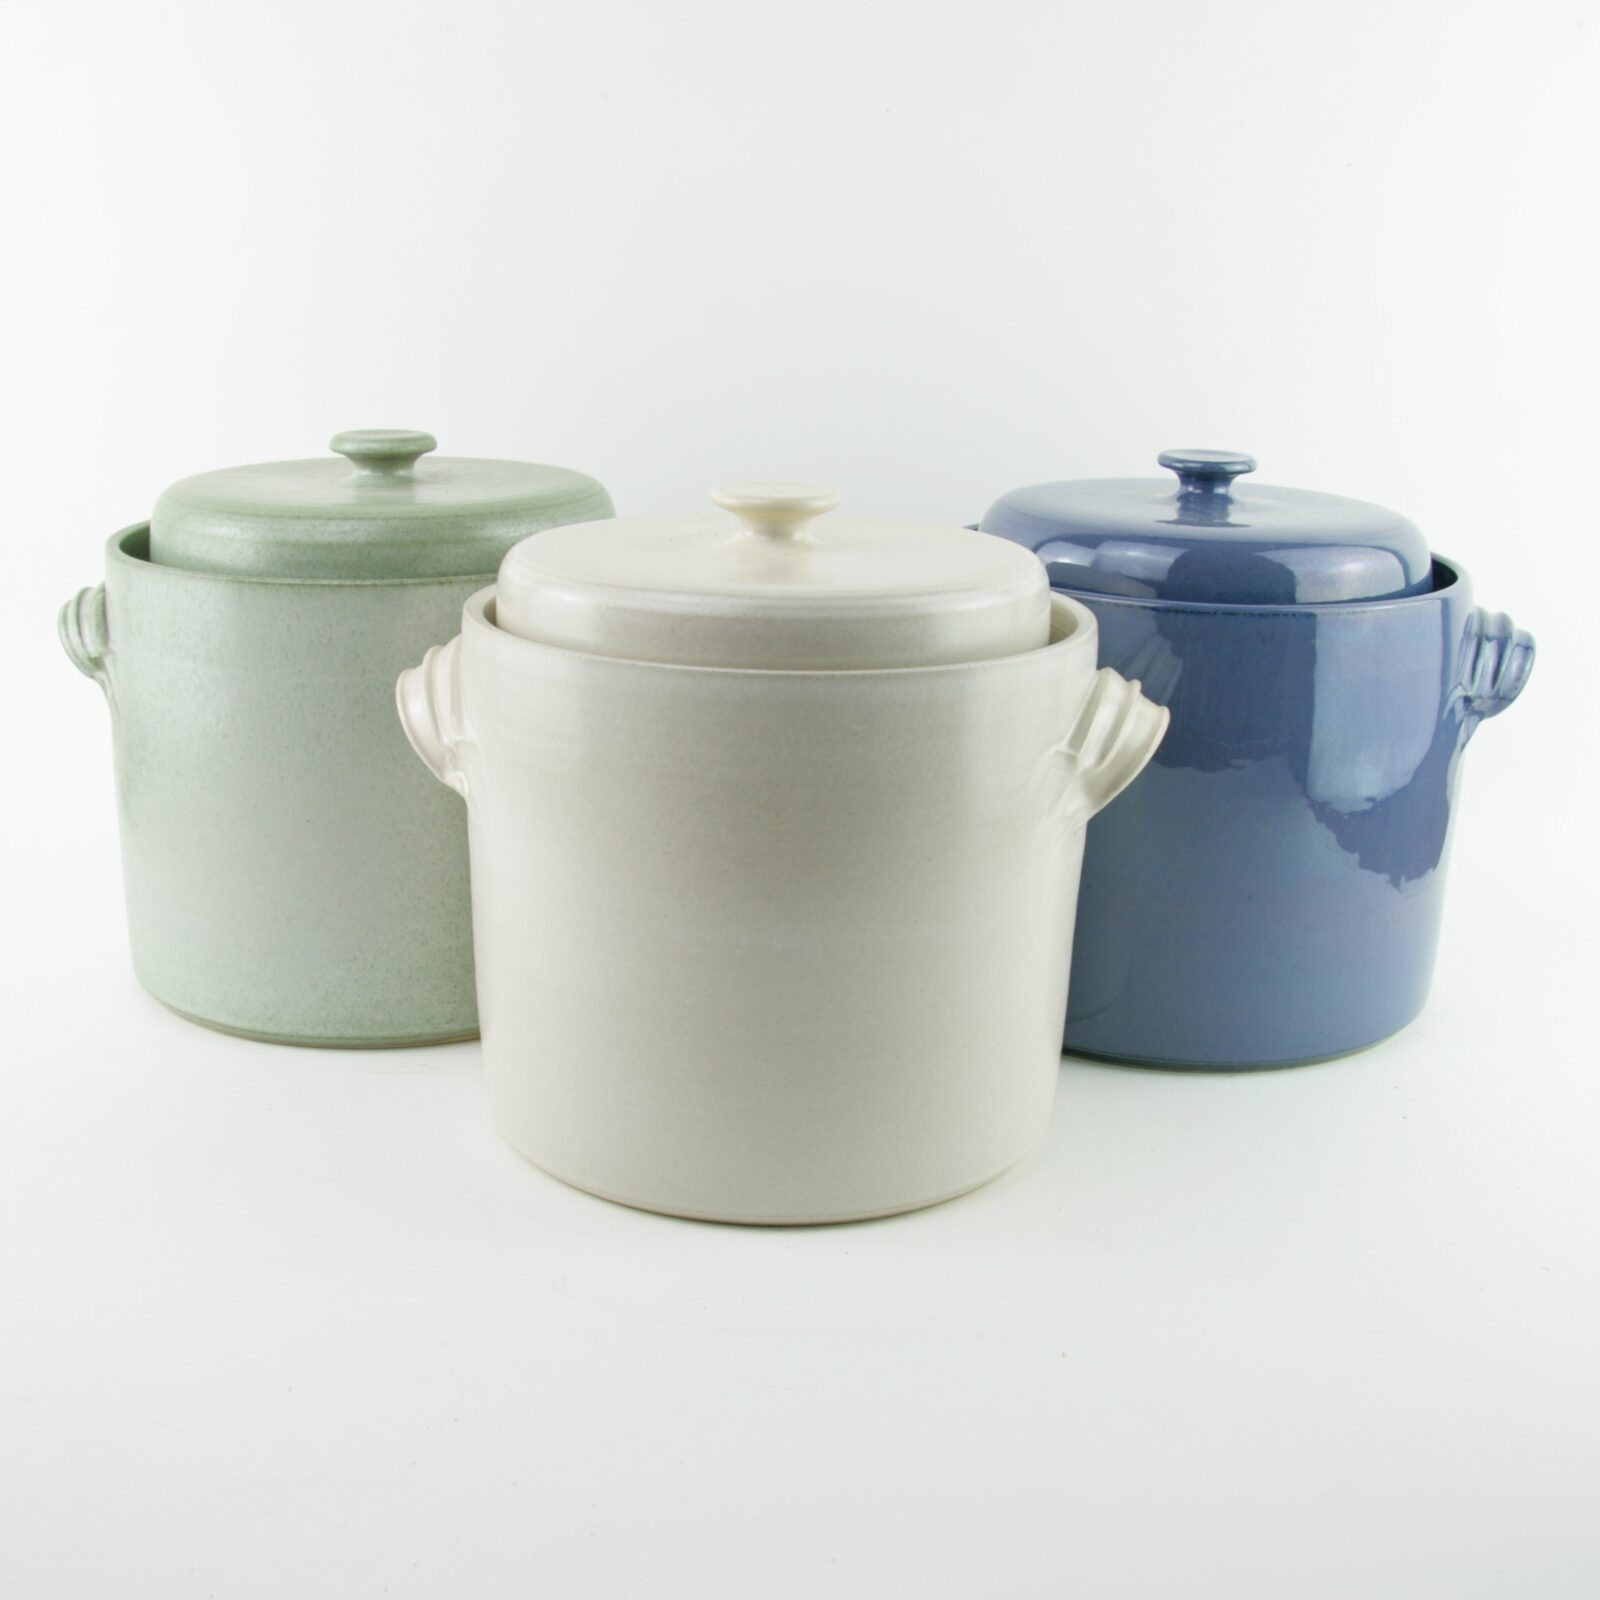 2 litre handmade ceramic sauerkraut crocks for making sauerkraut and kimchi